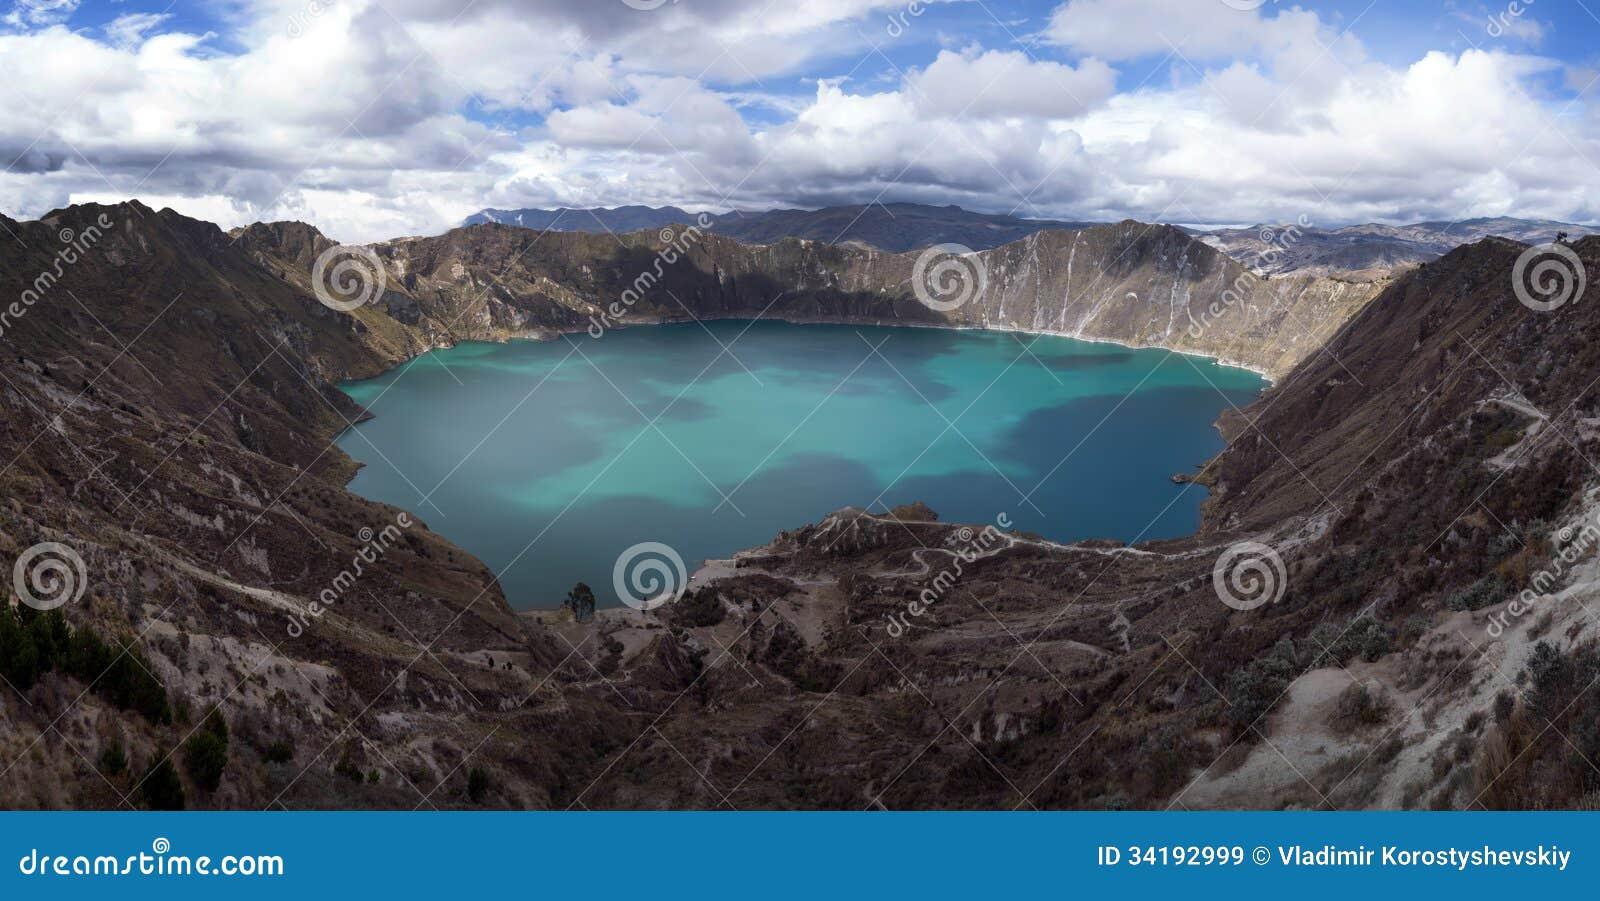 Quilotoa Caldera Stock Image  Image Of Mountains  View